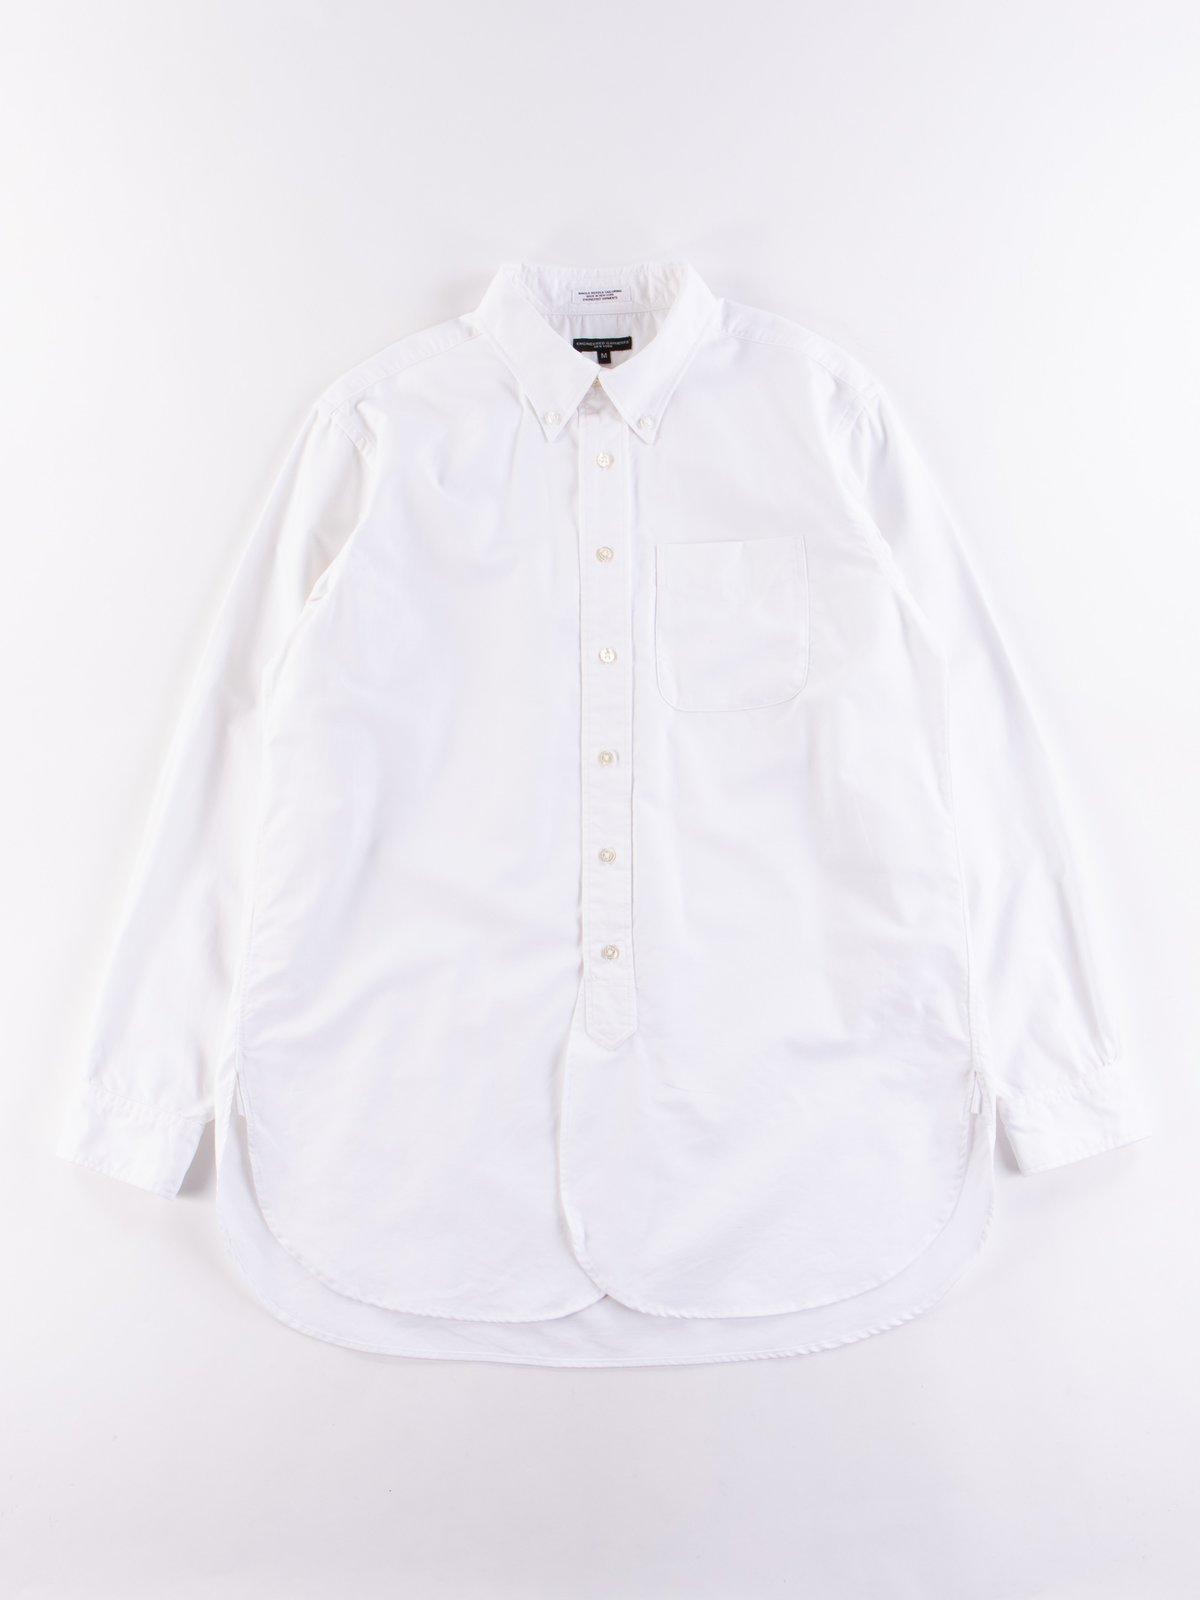 White Cotton Oxford 19th Century BD Shirt - Image 1